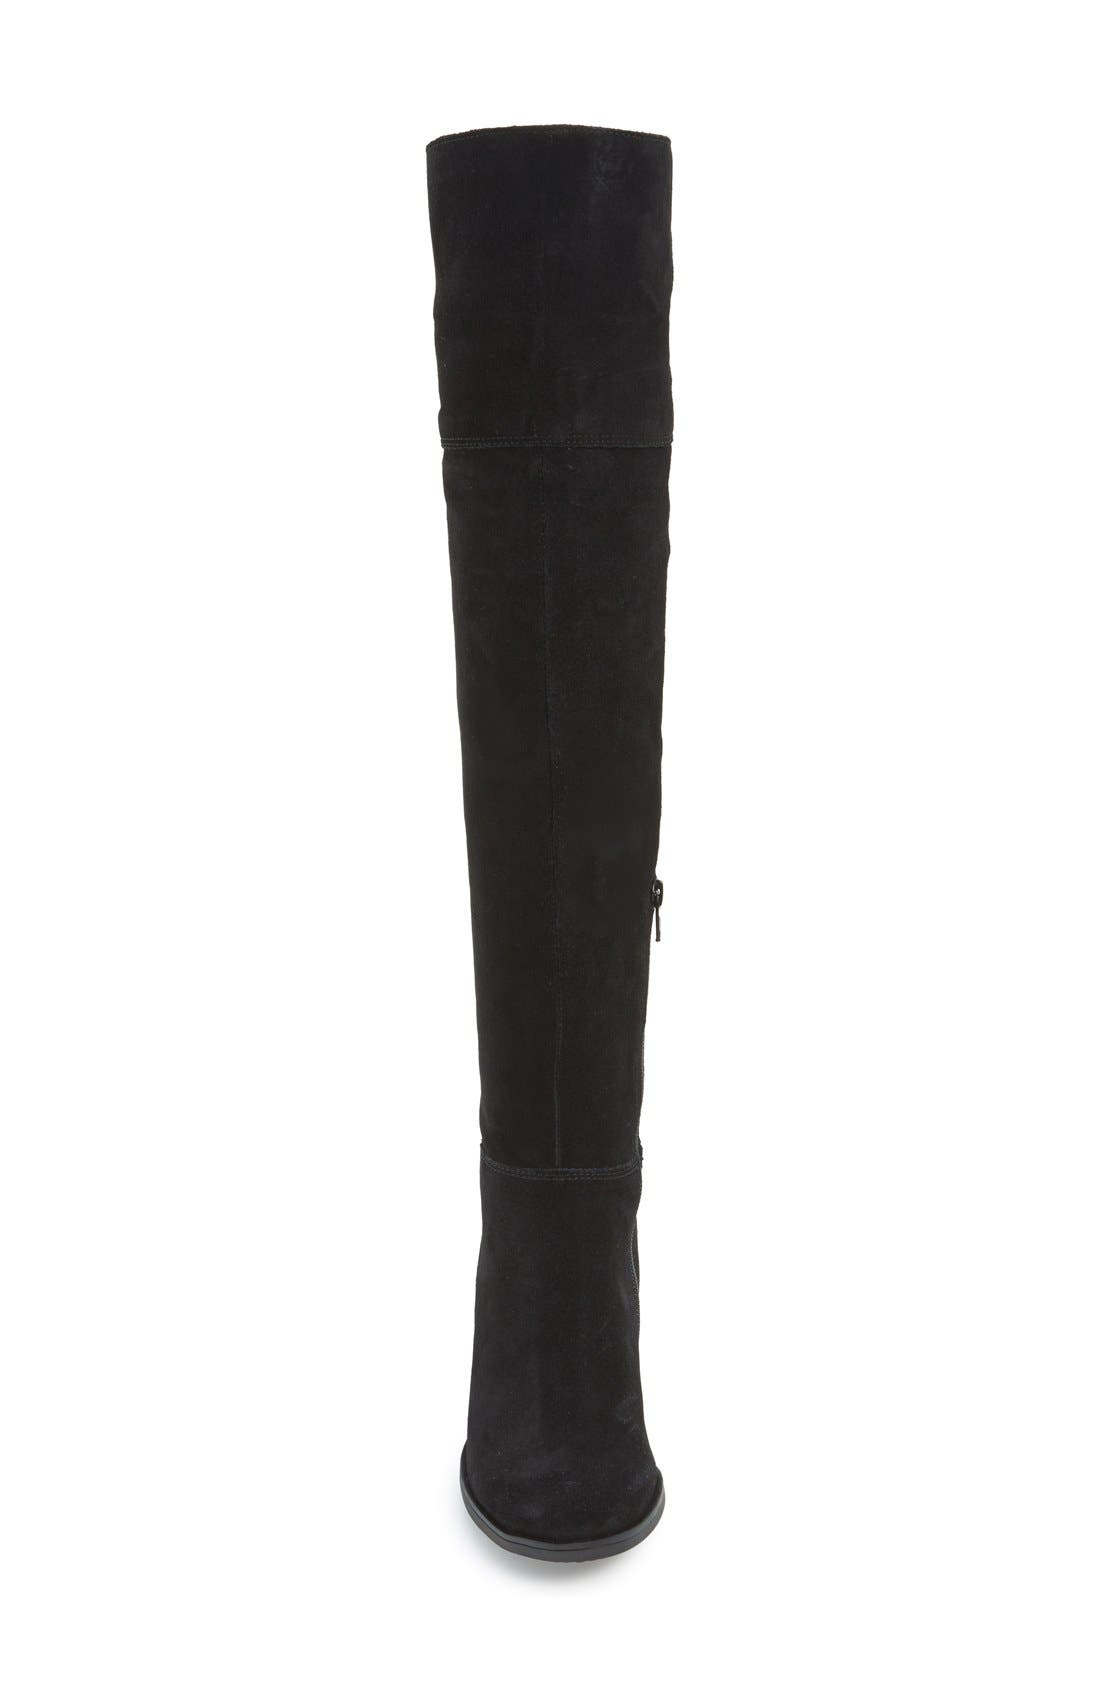 'Orabela' Knee High Boot,                             Alternate thumbnail 3, color,                             006